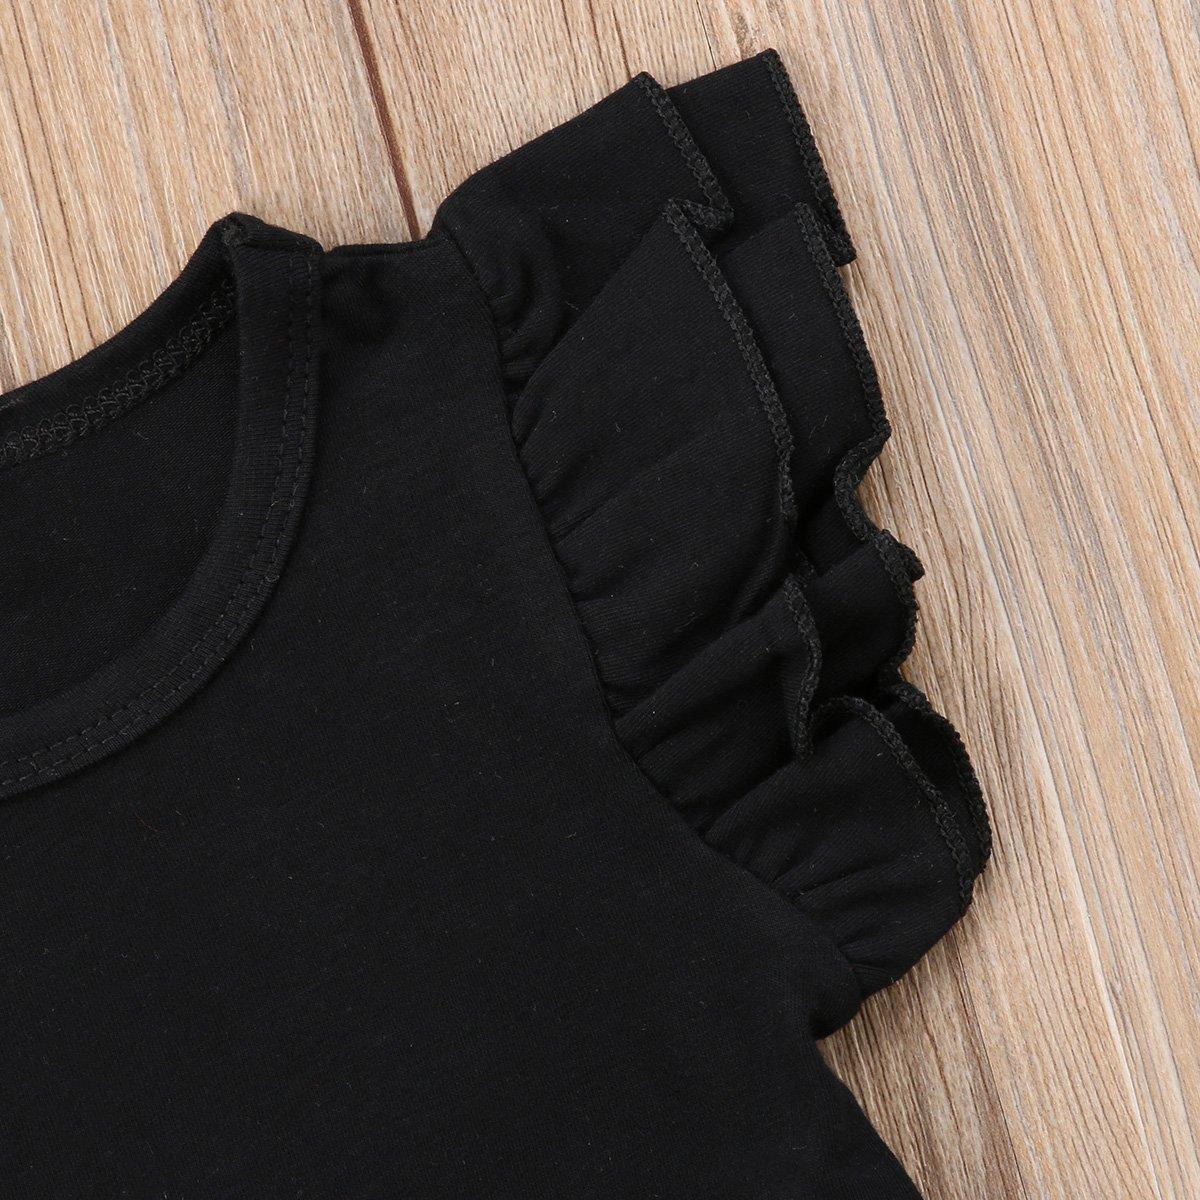 Mubineo Toddler Baby Girl Basic Plain Ruffle Sleeve Cotton T Shirts Tops Tee Clothes